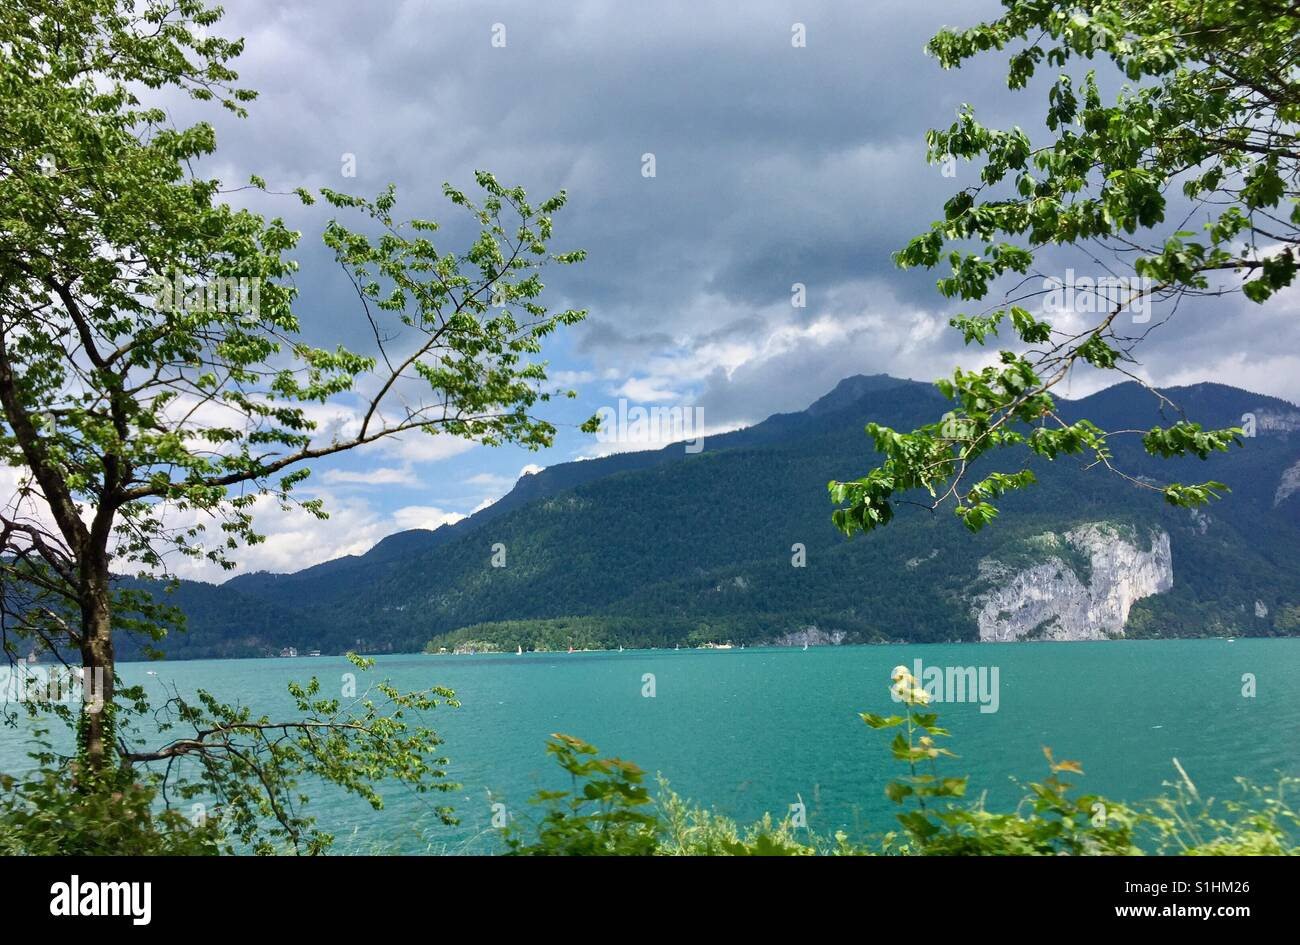 Wetter Wolfgangsee